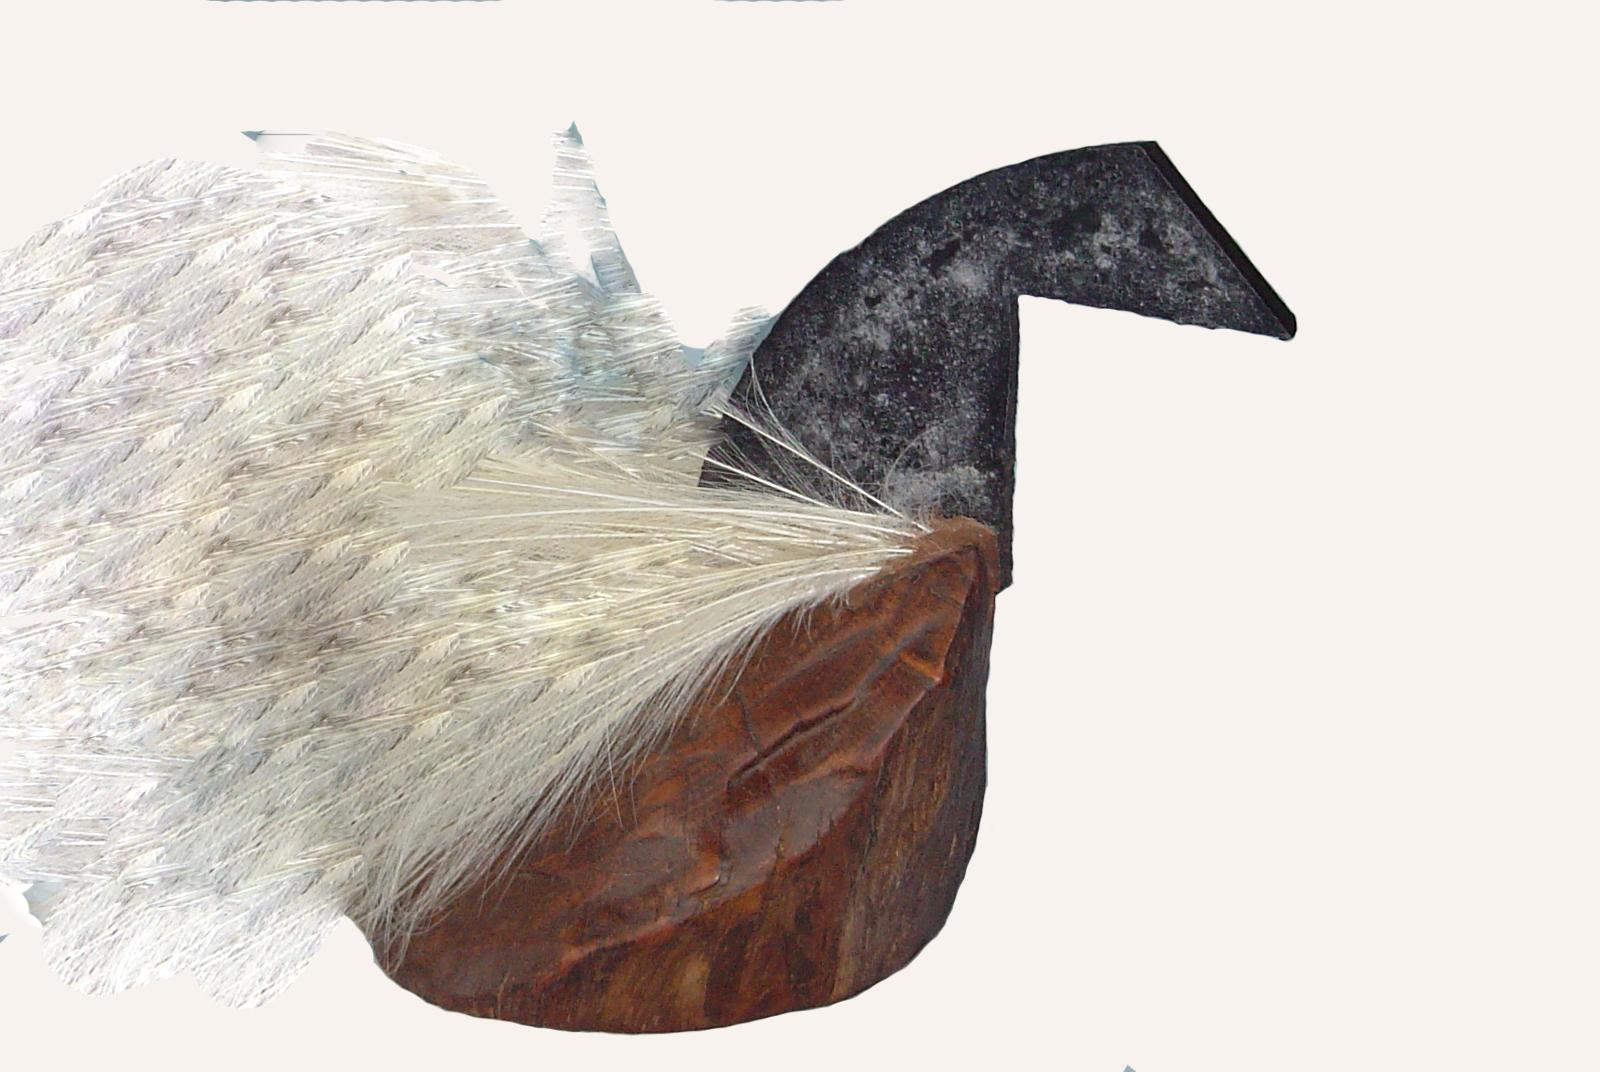 Cisne, Milagros